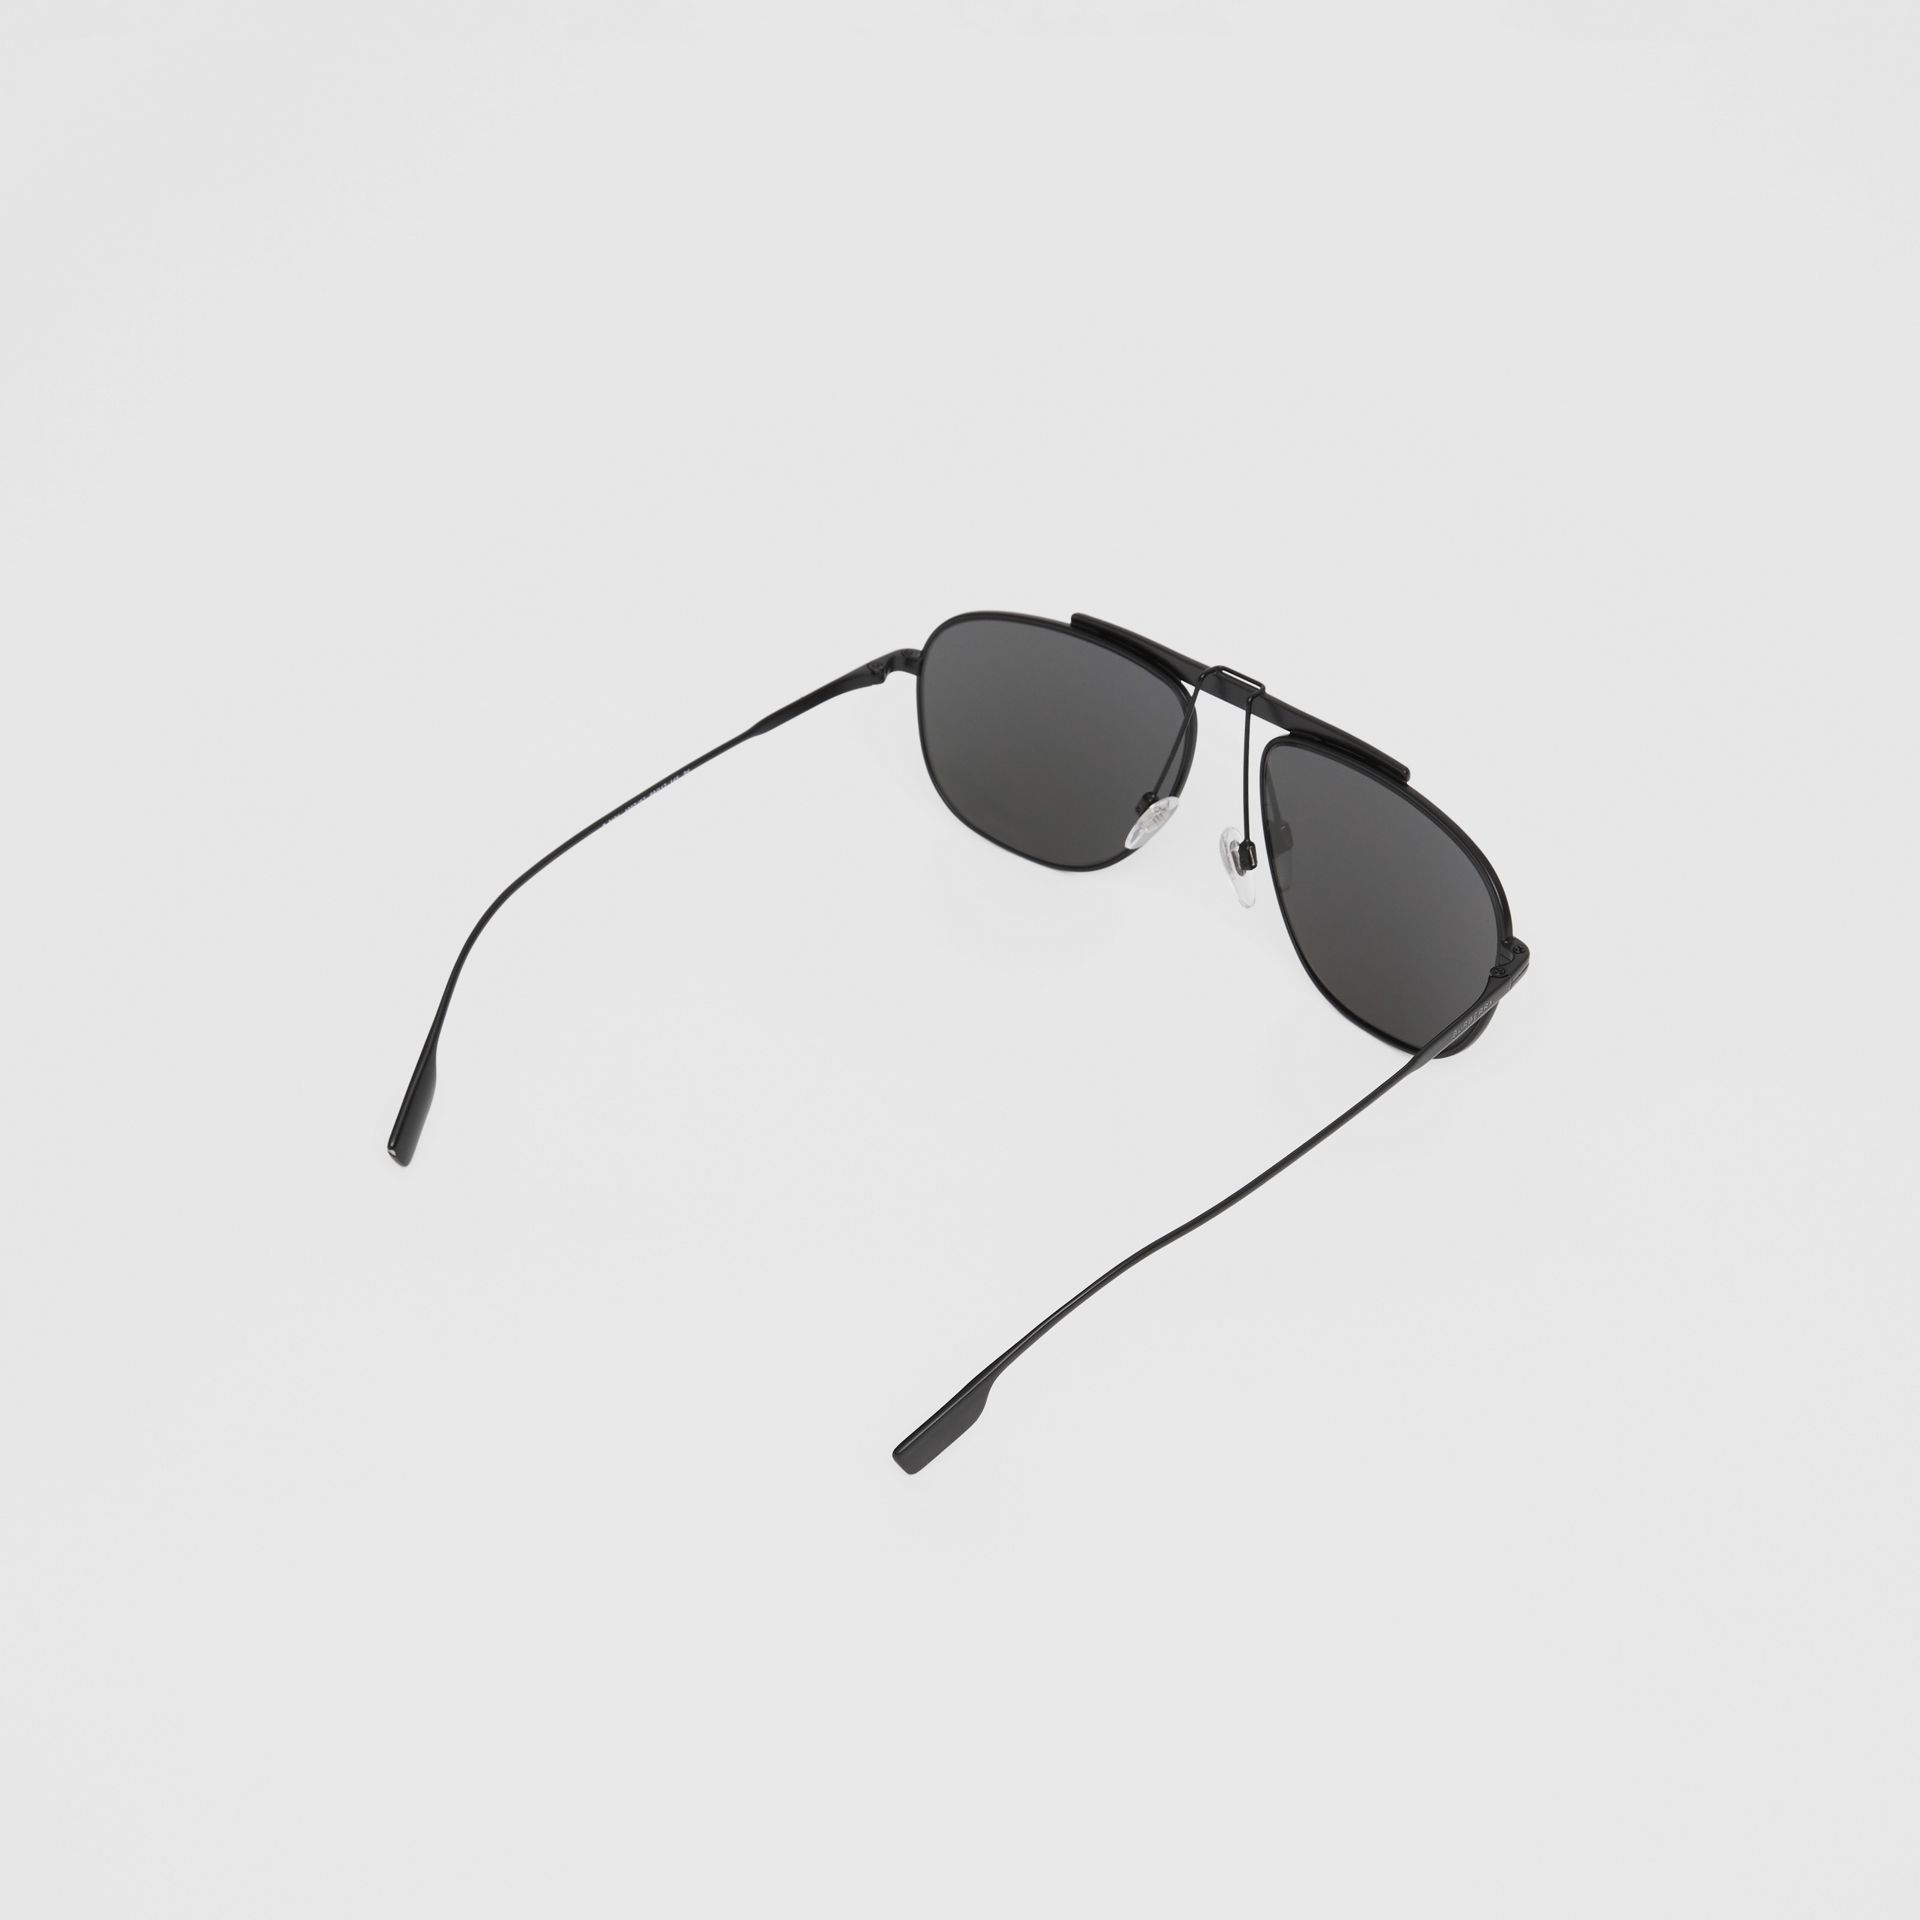 Pilot Sunglasses in Matte Black - Men | Burberry - gallery image 4